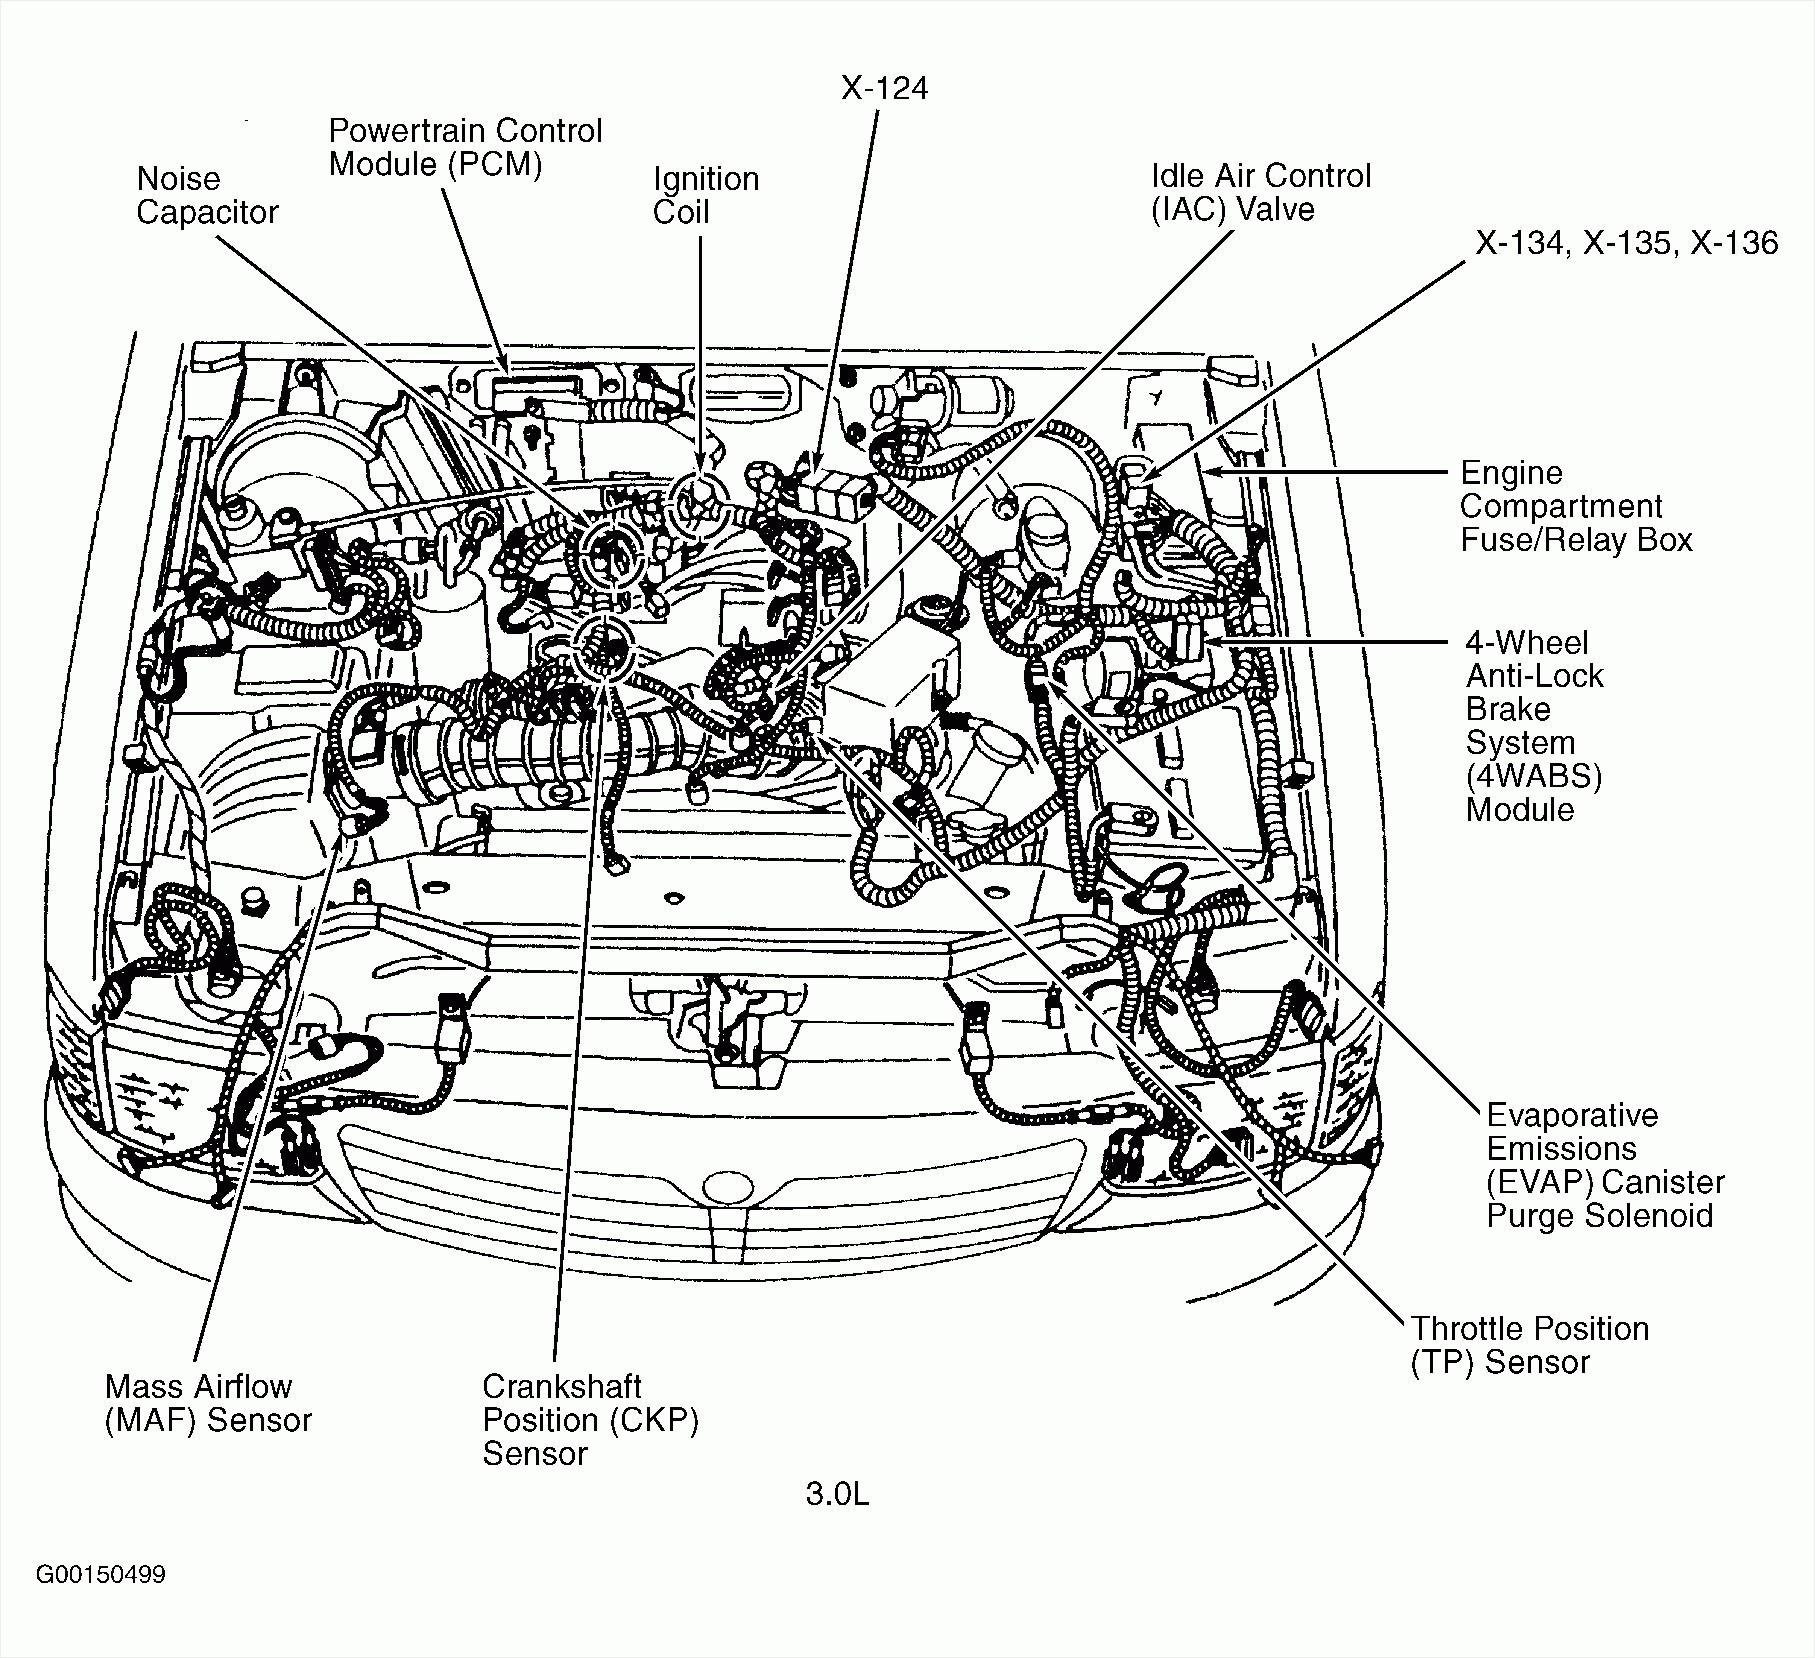 mazda rx8 engine parts diagram menhavestyle1 com mazda miata diagram wiring  diagrams 2004 mazda rx 8